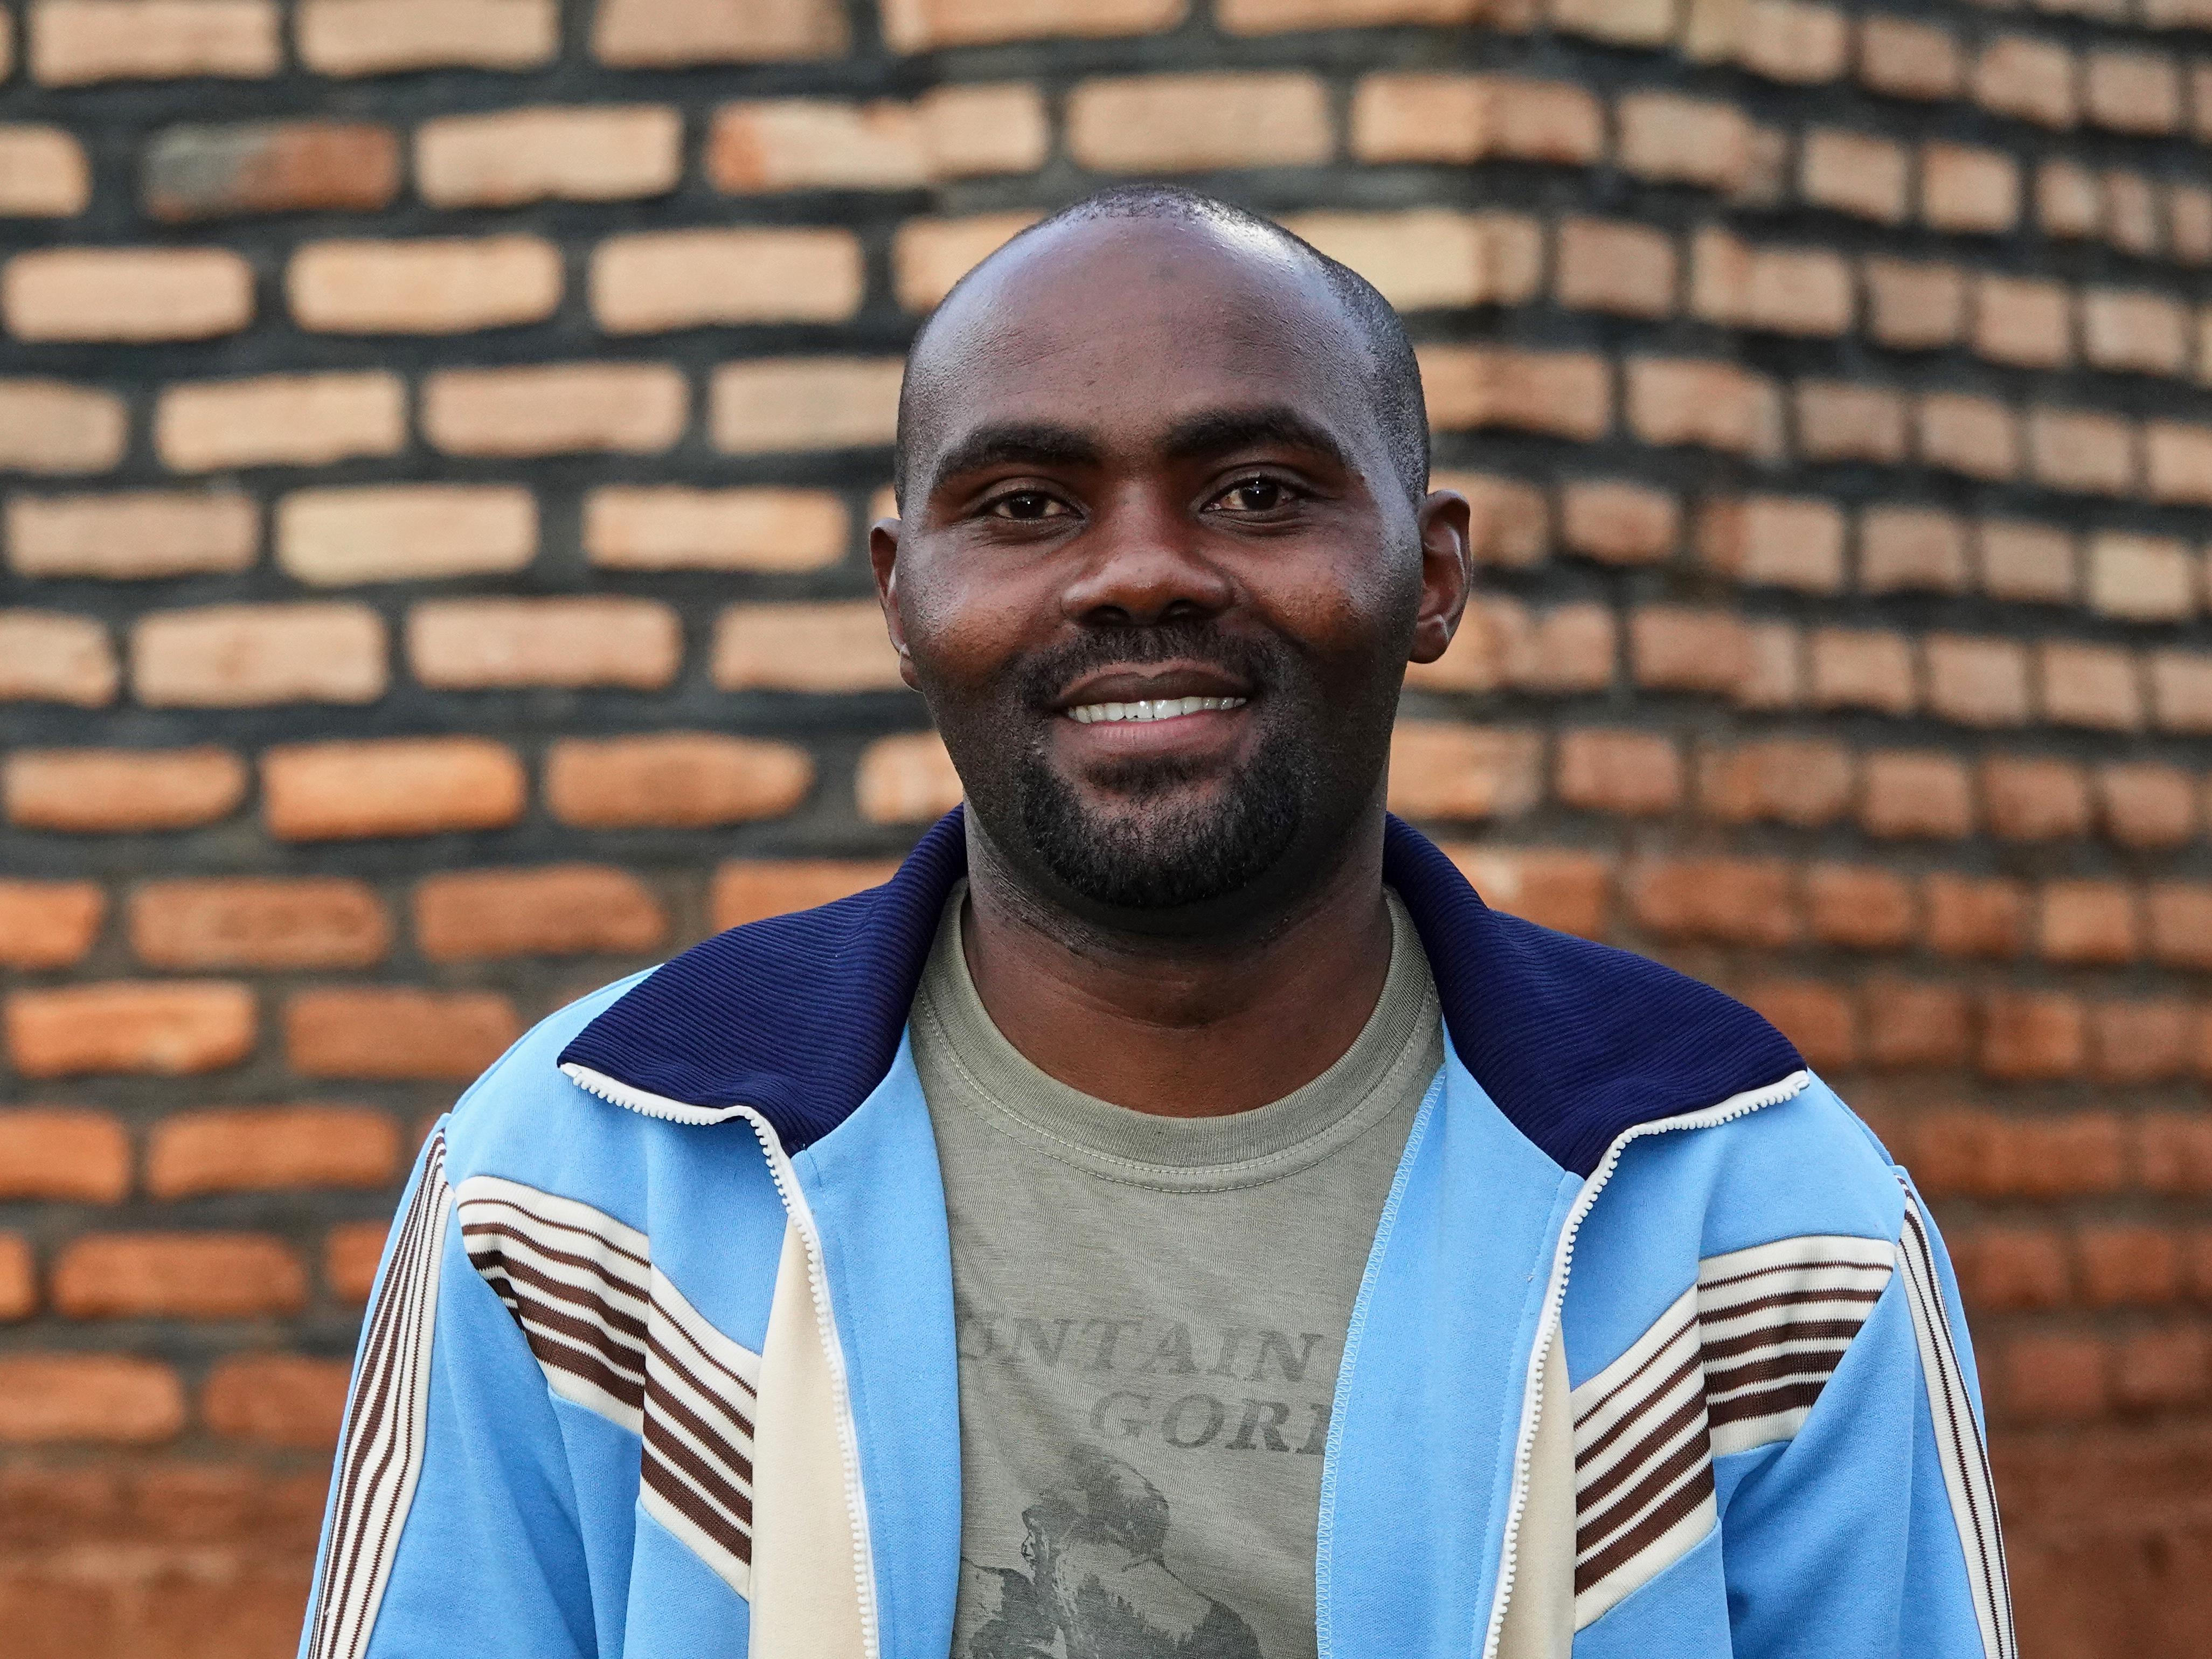 Le visage souriant du guide Anacret Nsengiyumva.